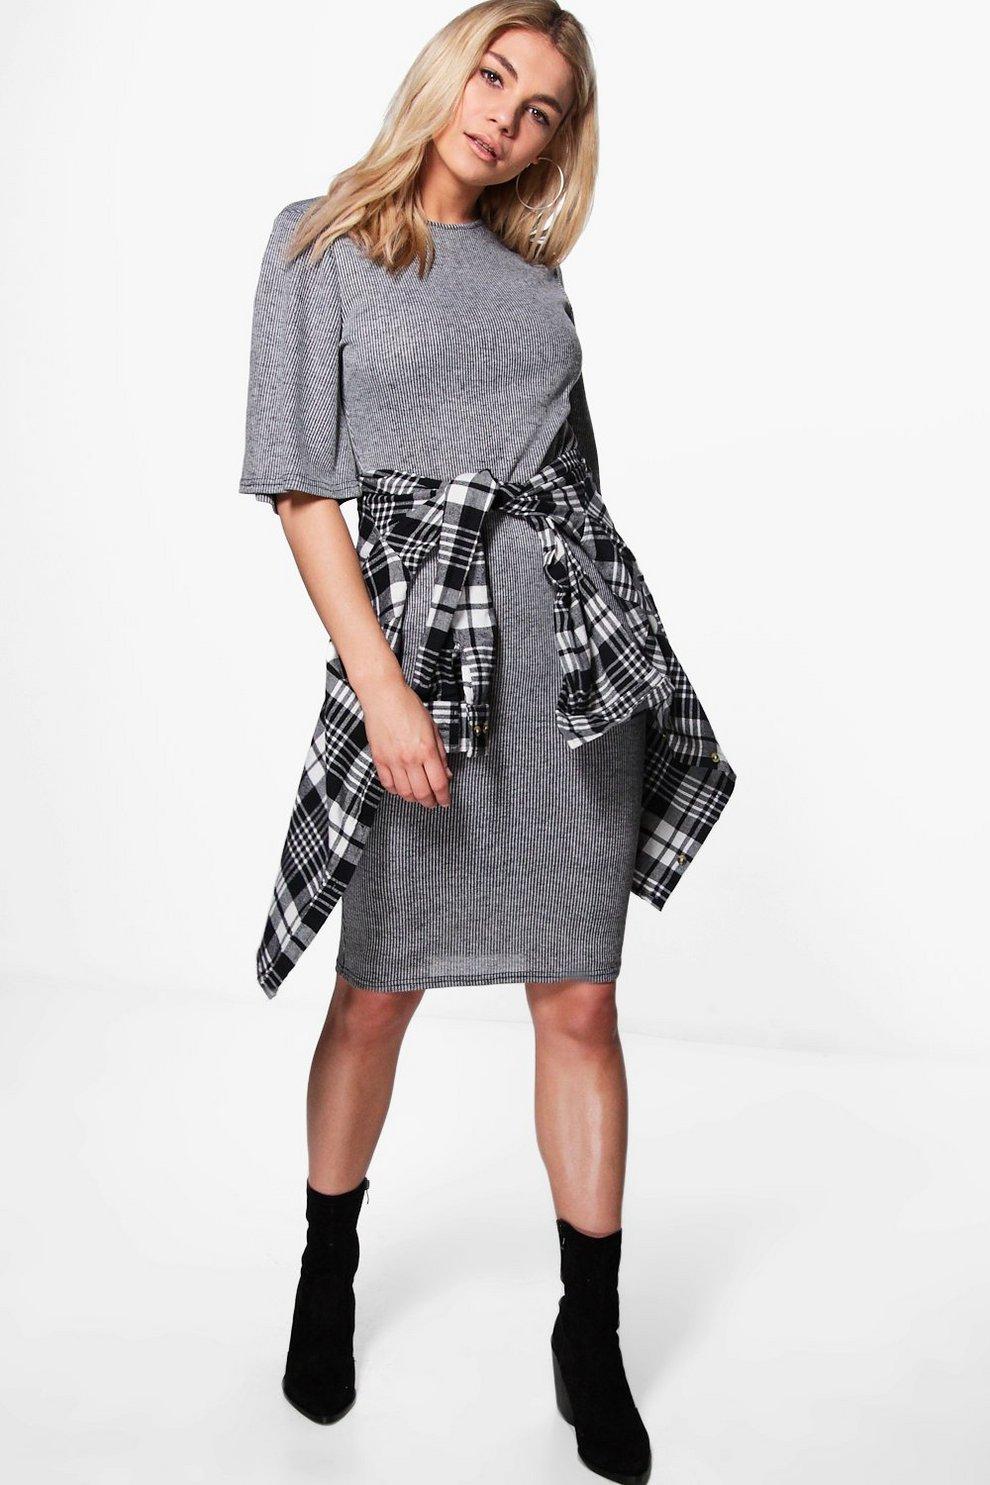 ba743d51ce55 India Ribbed Short Sleeve Bodycon Dress